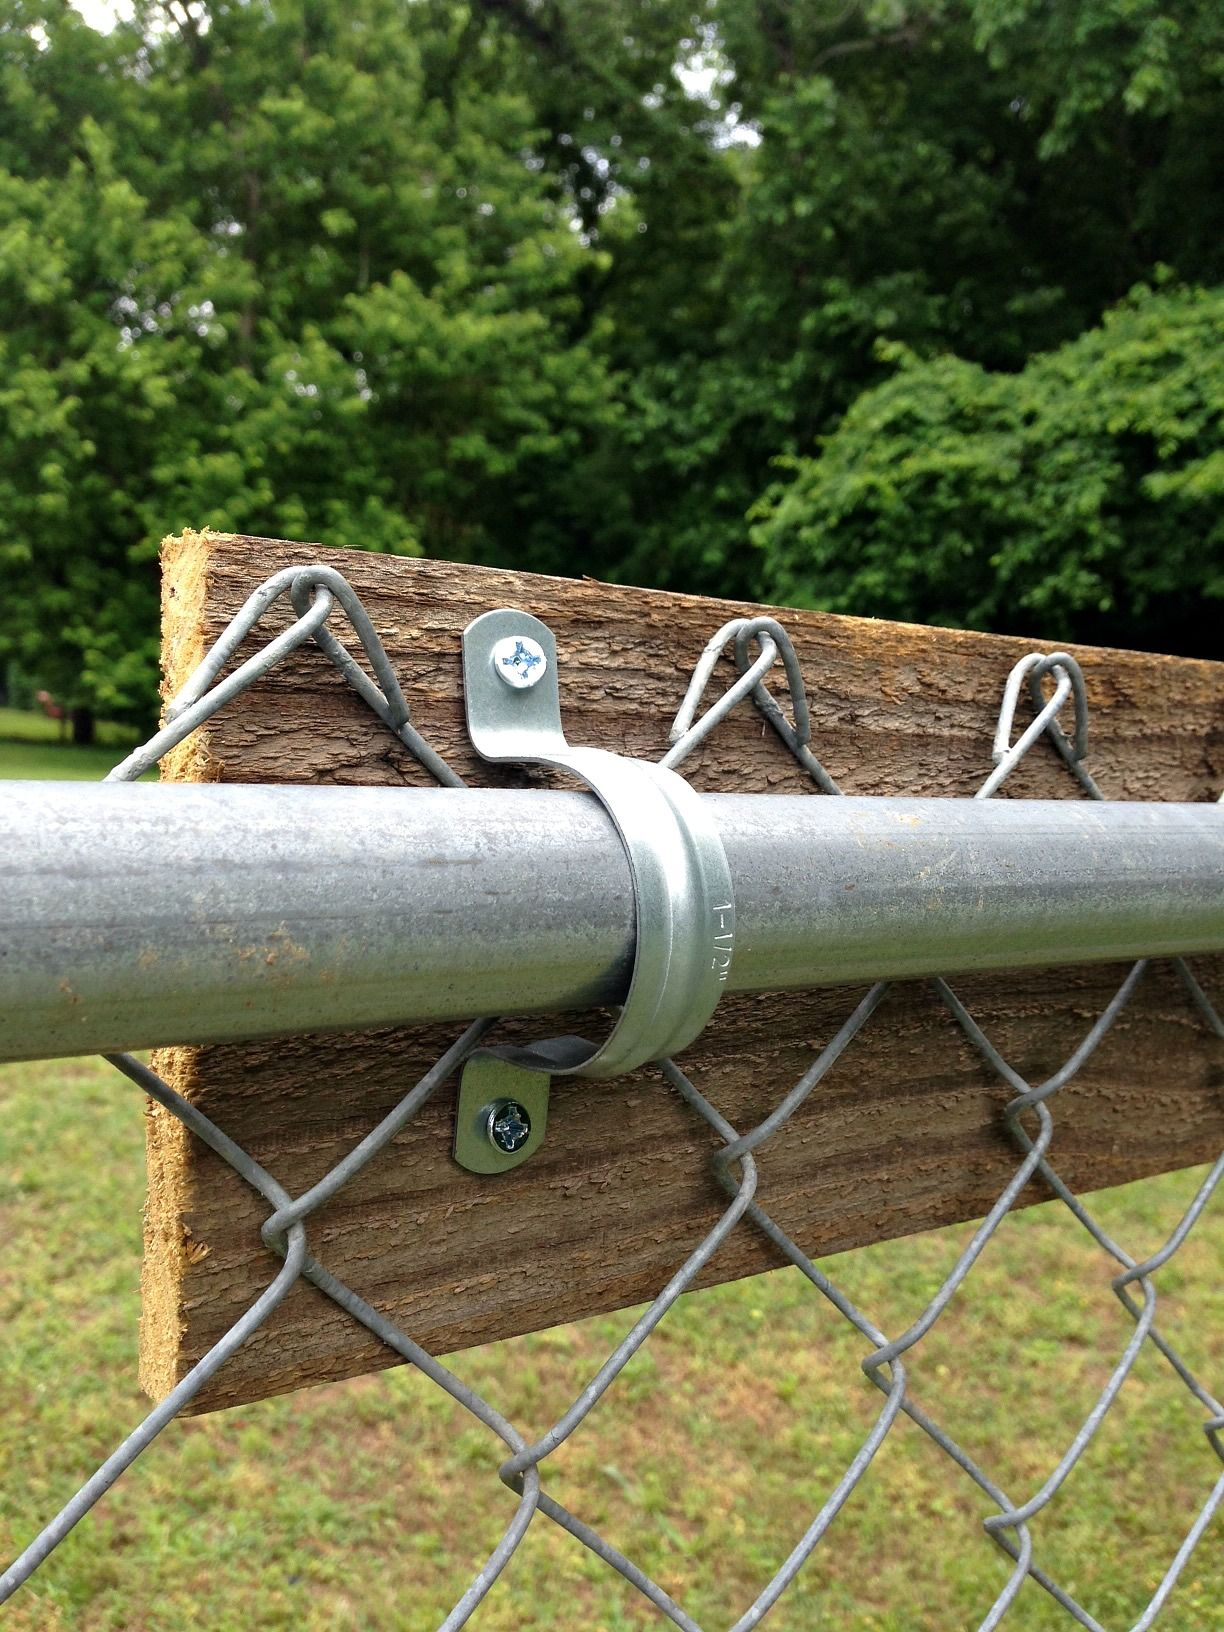 Cordial Fence Decor Garden Decor Ideas Fence Ideas Decorating Your Garden Fence Fenced Garden Backyard Fence Decorating Ideas